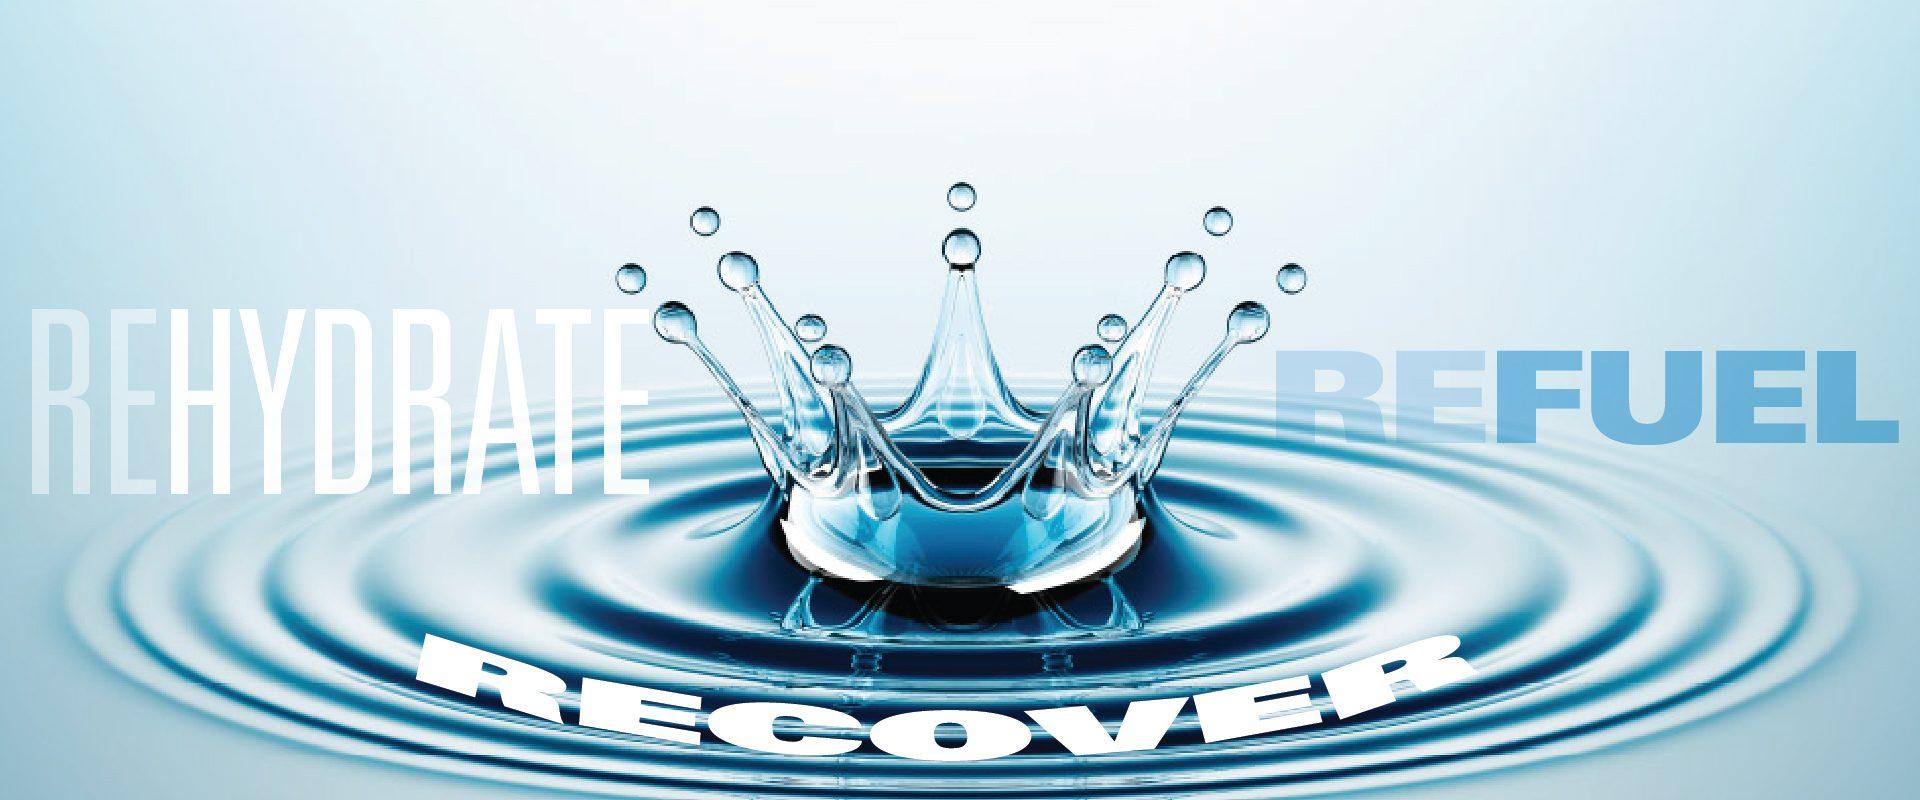 Vitargo REhydrate REfuel Recover